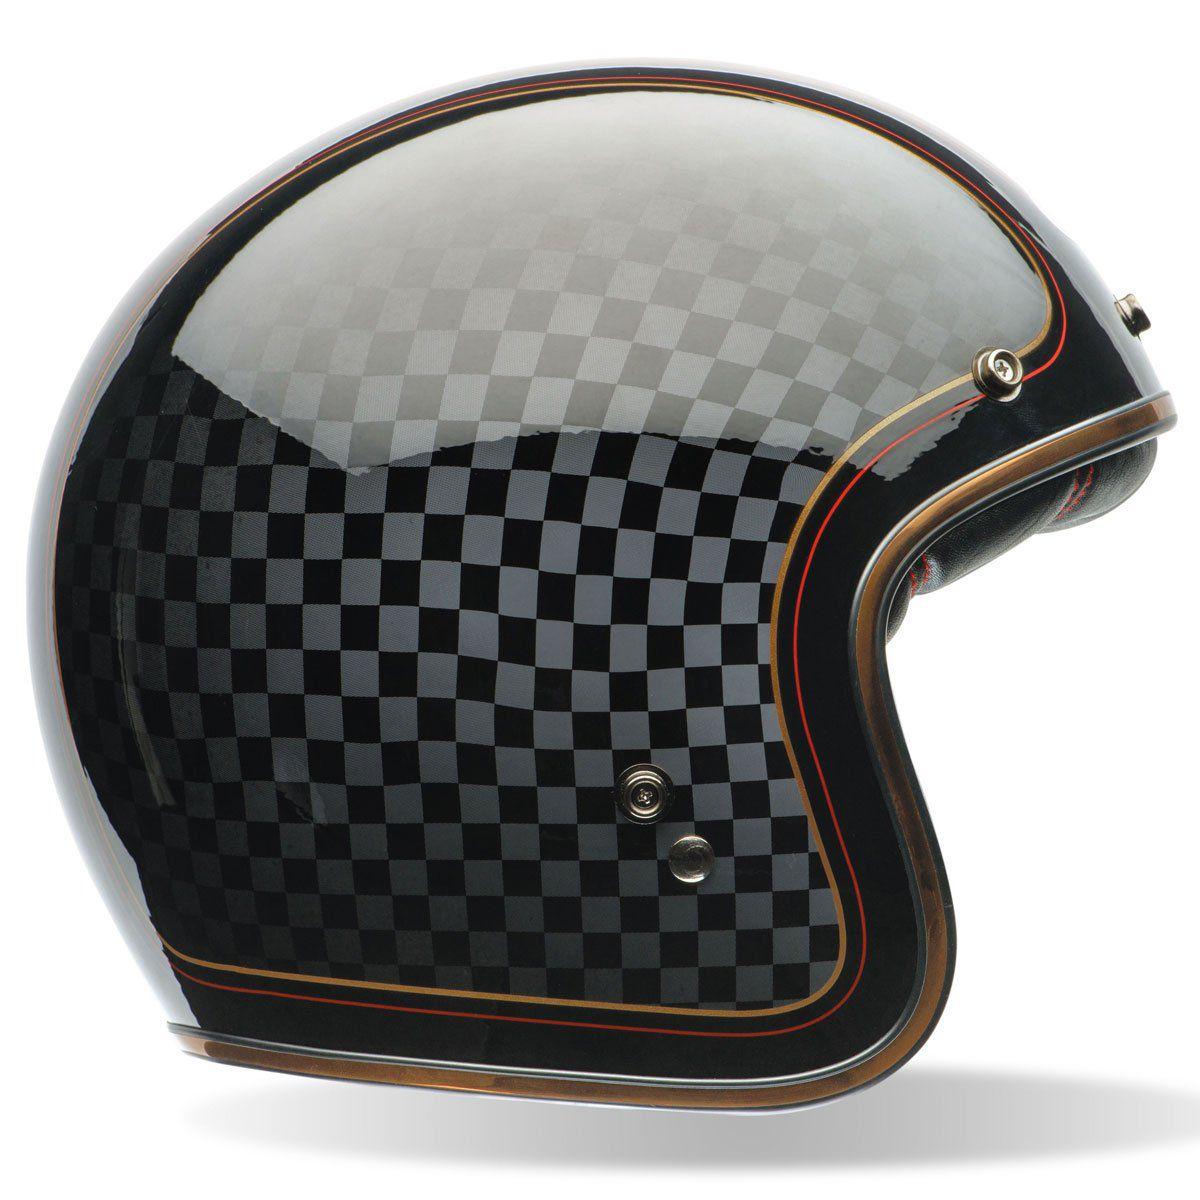 Capacete Bell Custom 500 RSD 74 Check It  - Planet Bike Shop Moto Acessórios